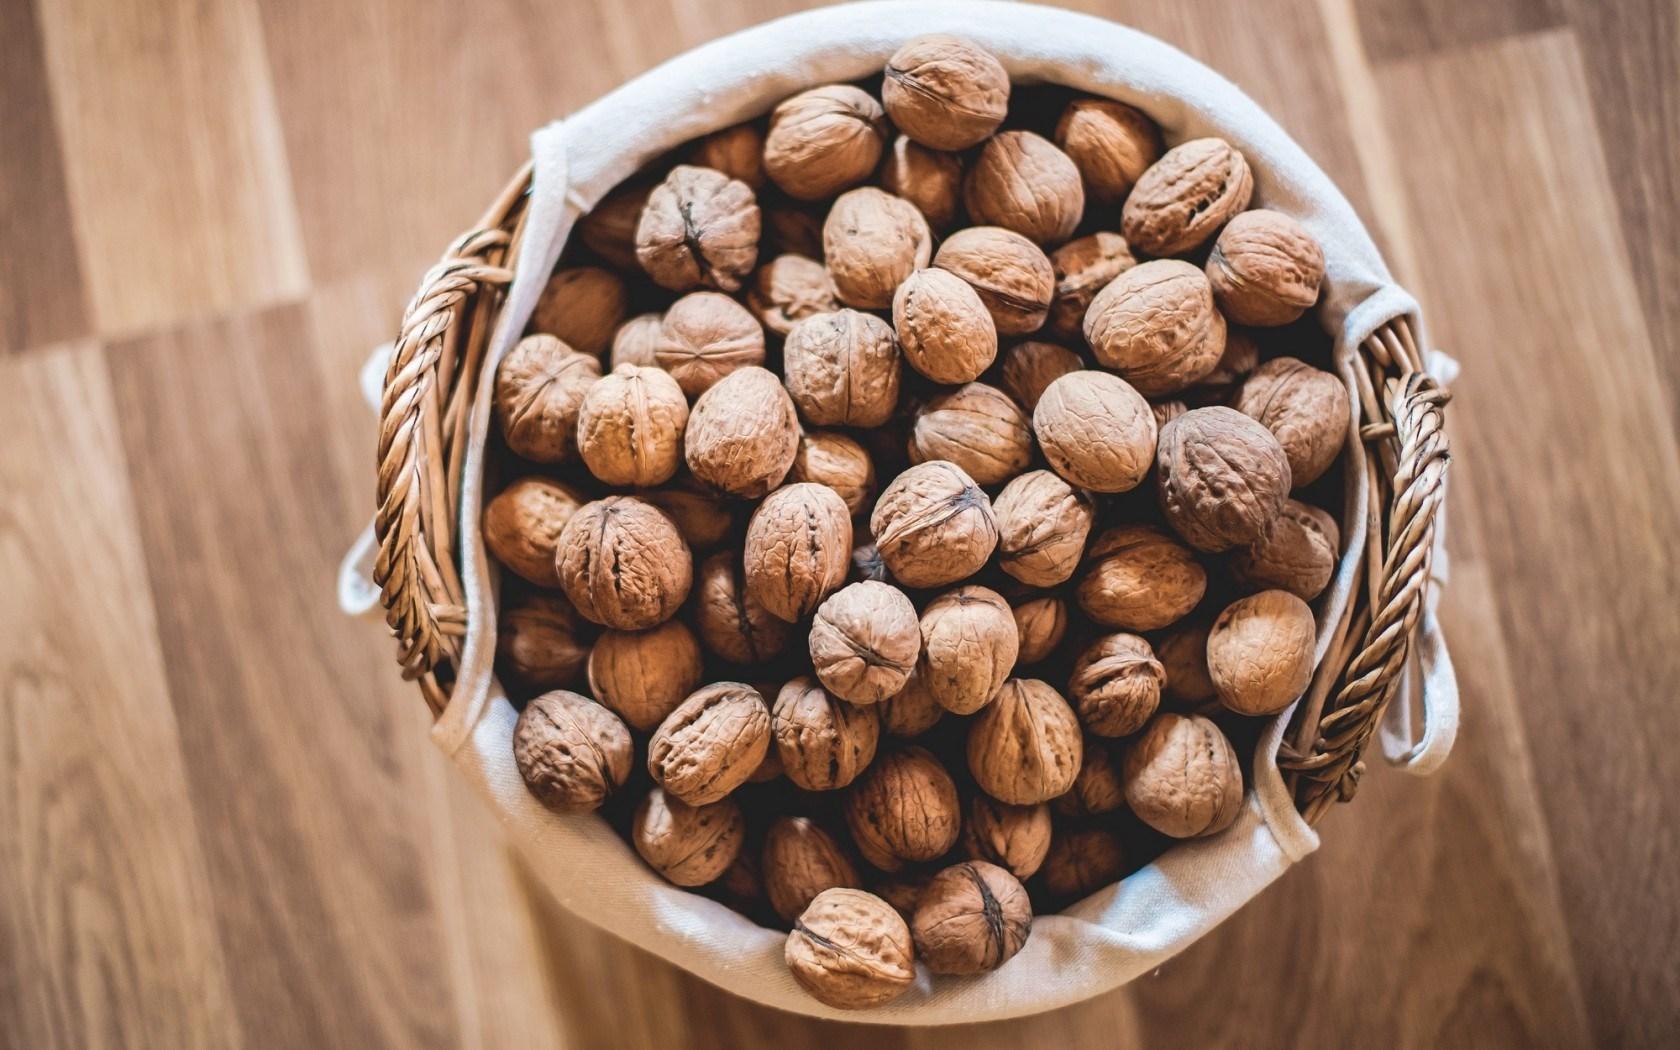 хранение грецких орехов